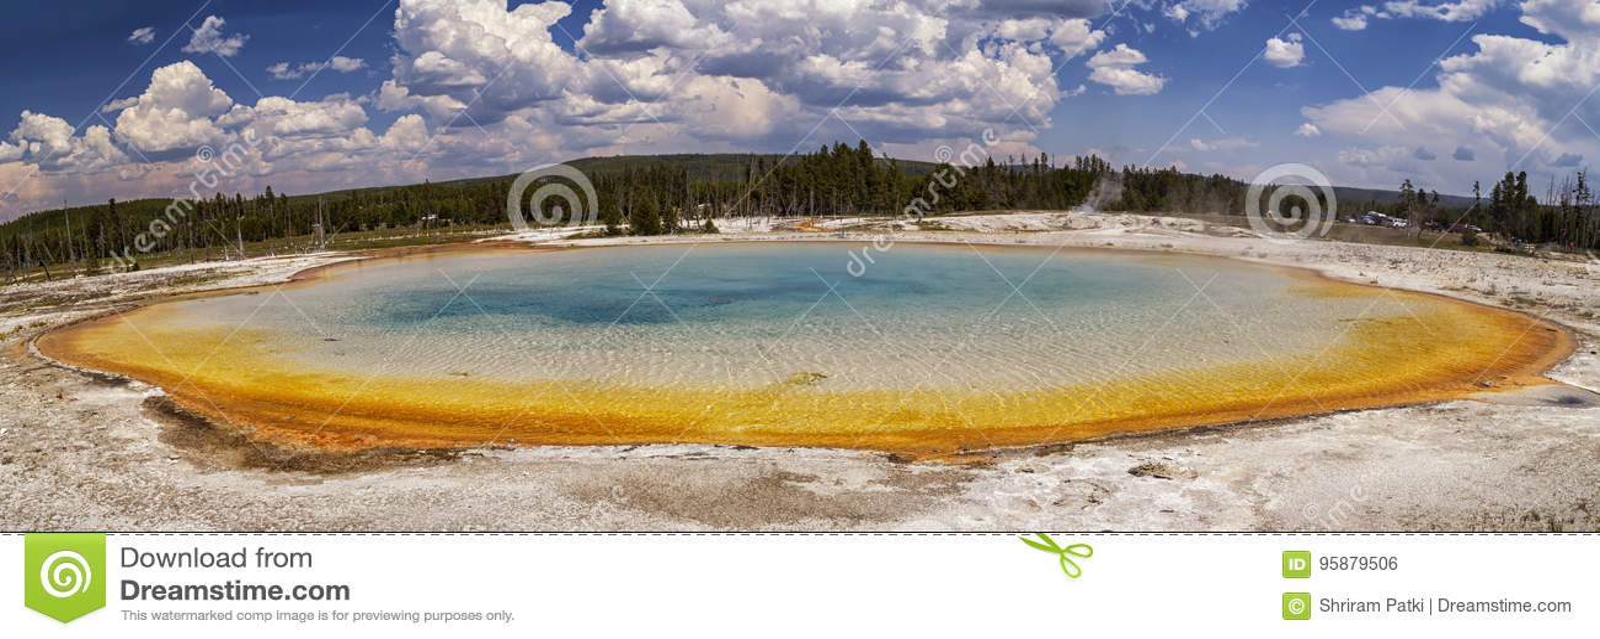 Beautiful panorama of Sunset lake at Black Sand Basin in Yellowstone National Park